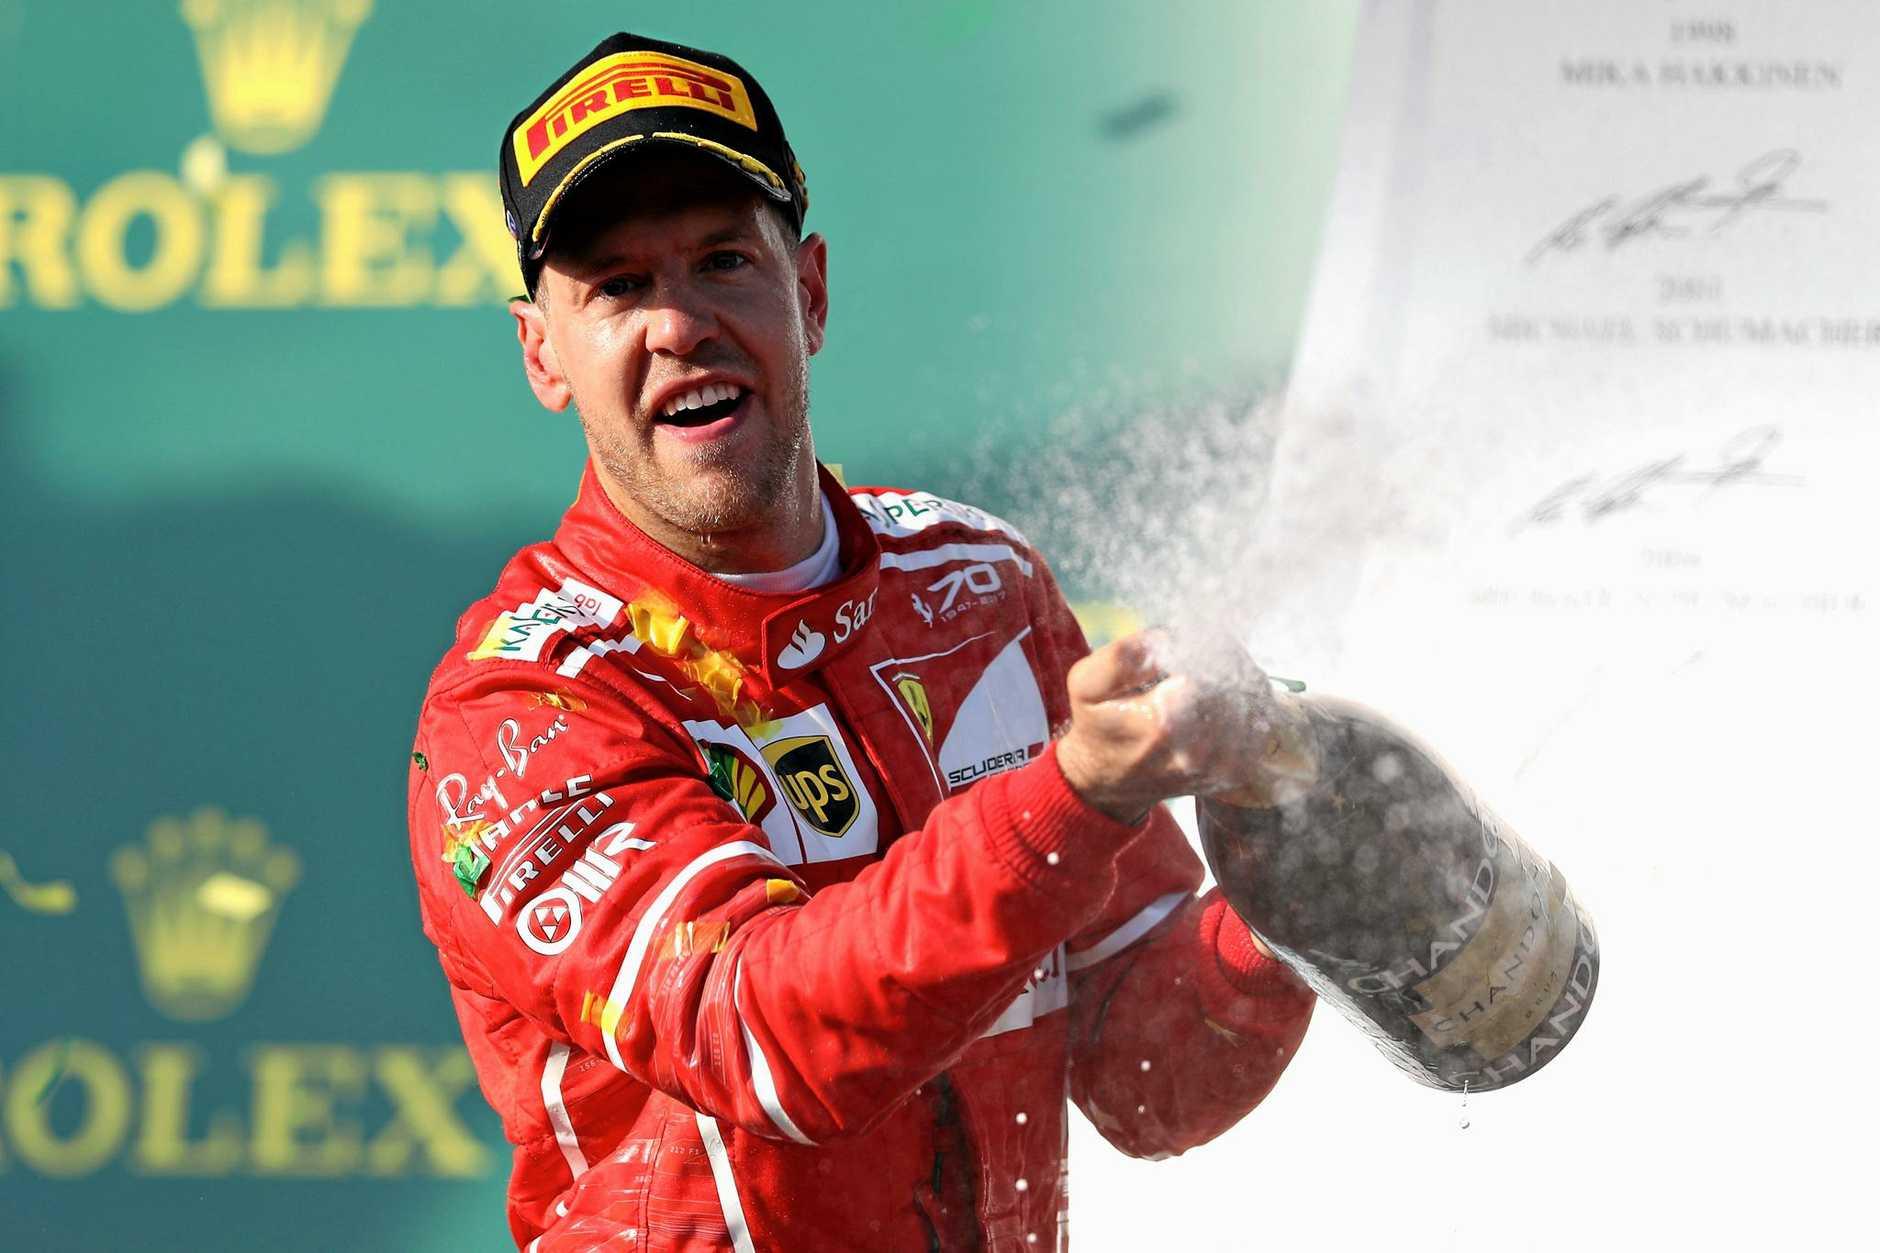 WINNER: Sebastian Vettel celebrates his victory on the podium.